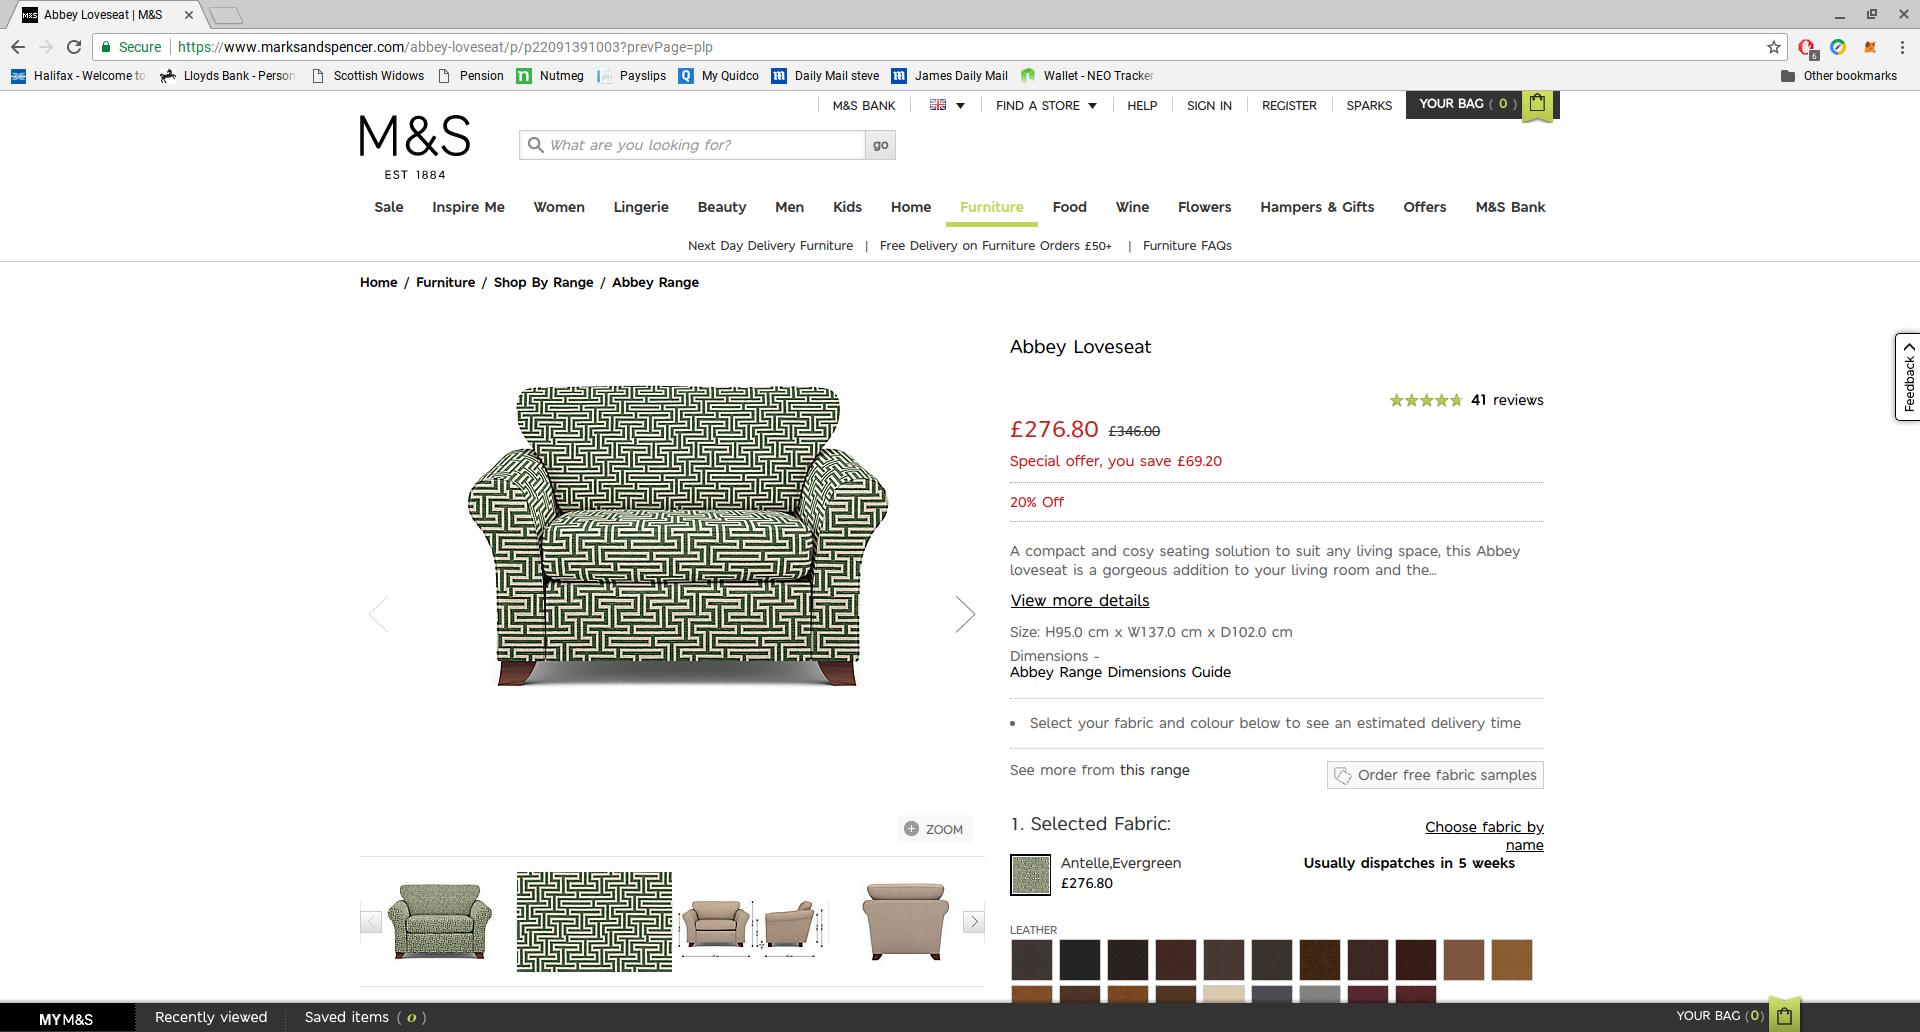 M&S Abbey Loveseat Armchair £276.80